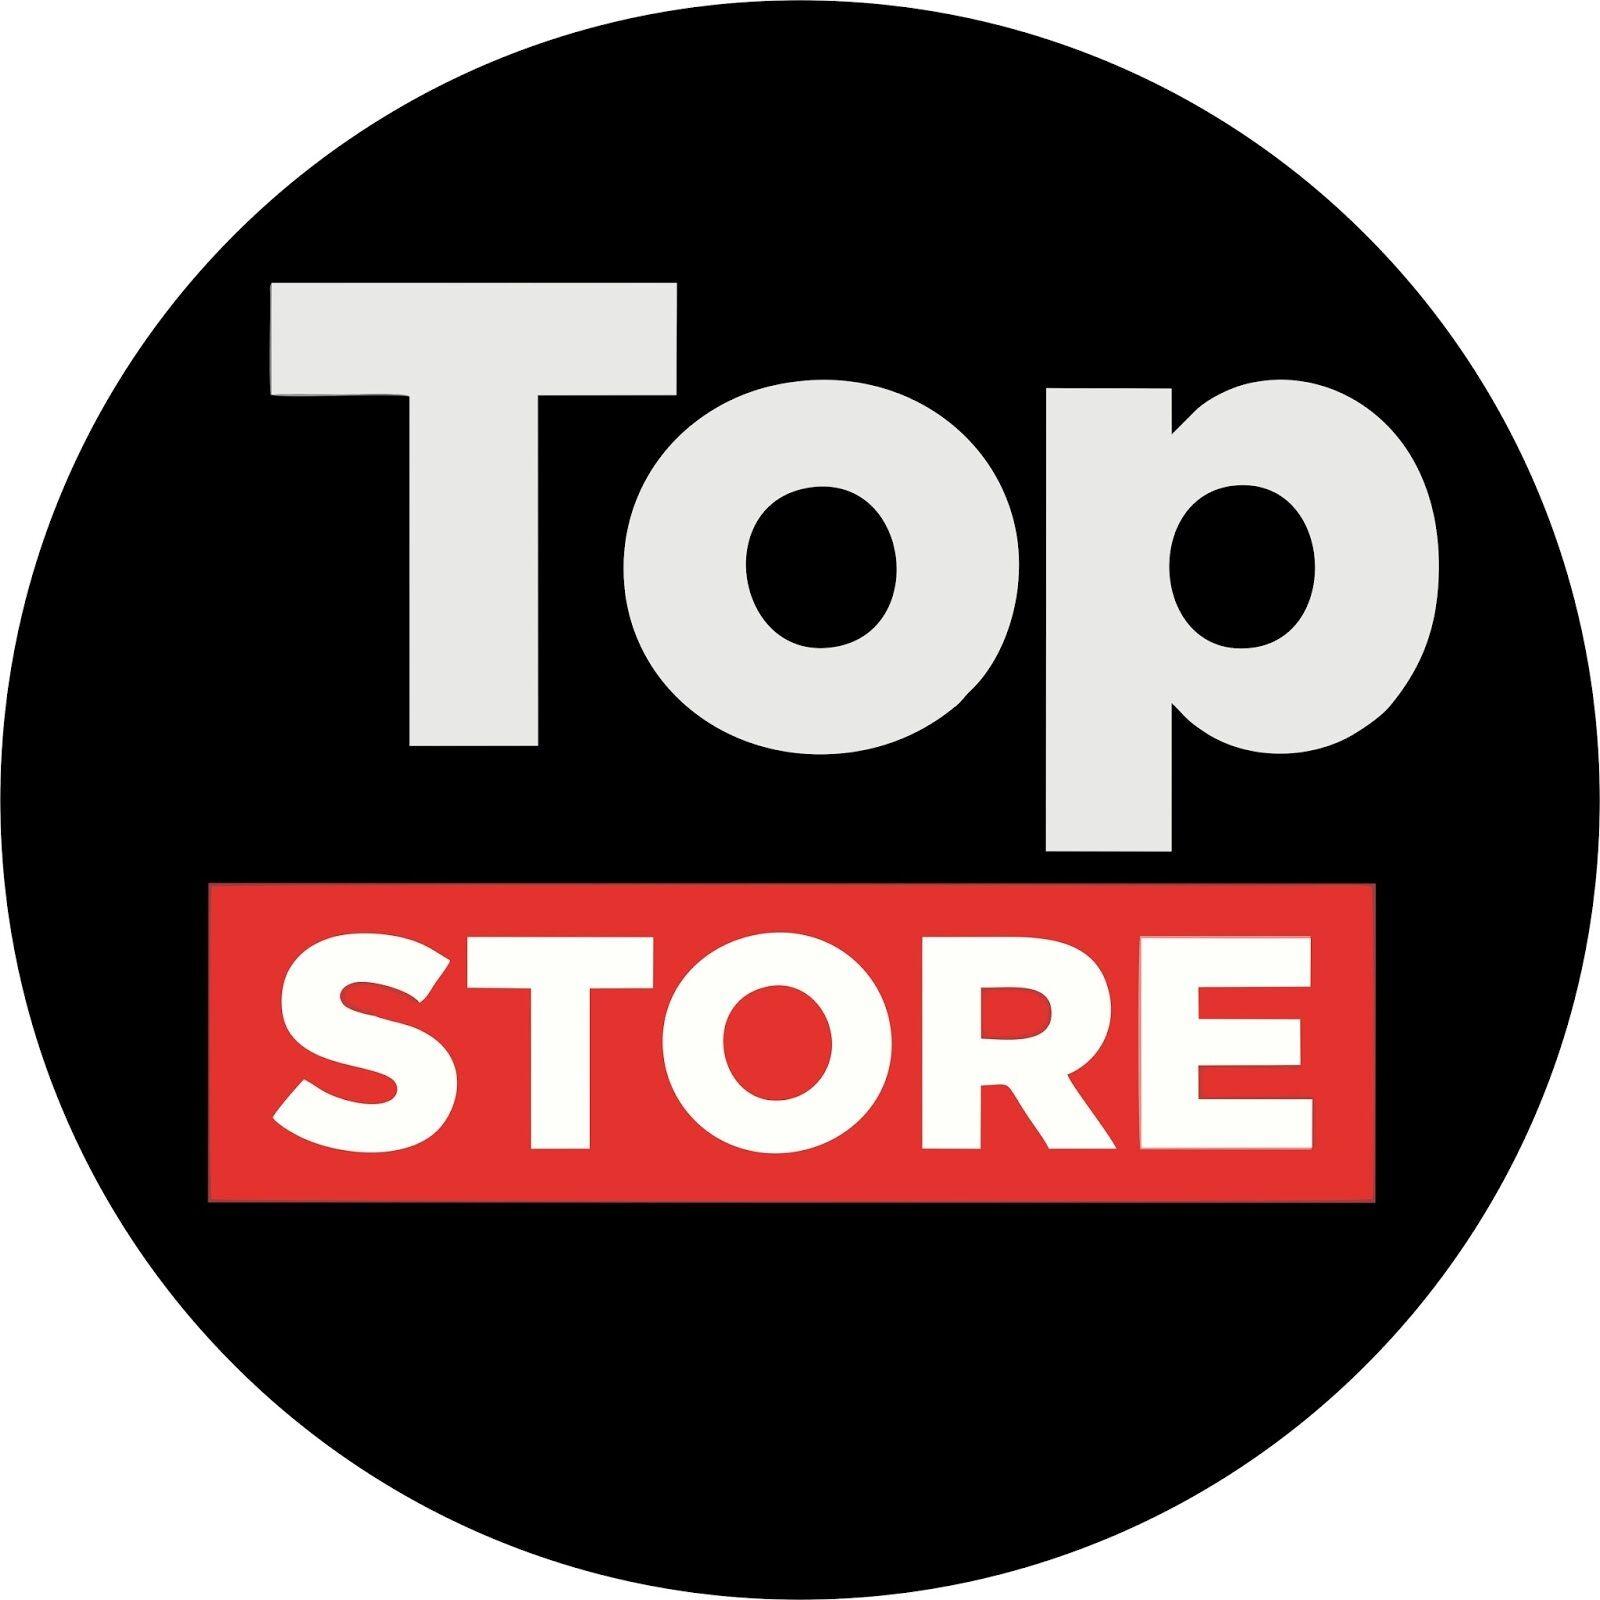 Topstor2014